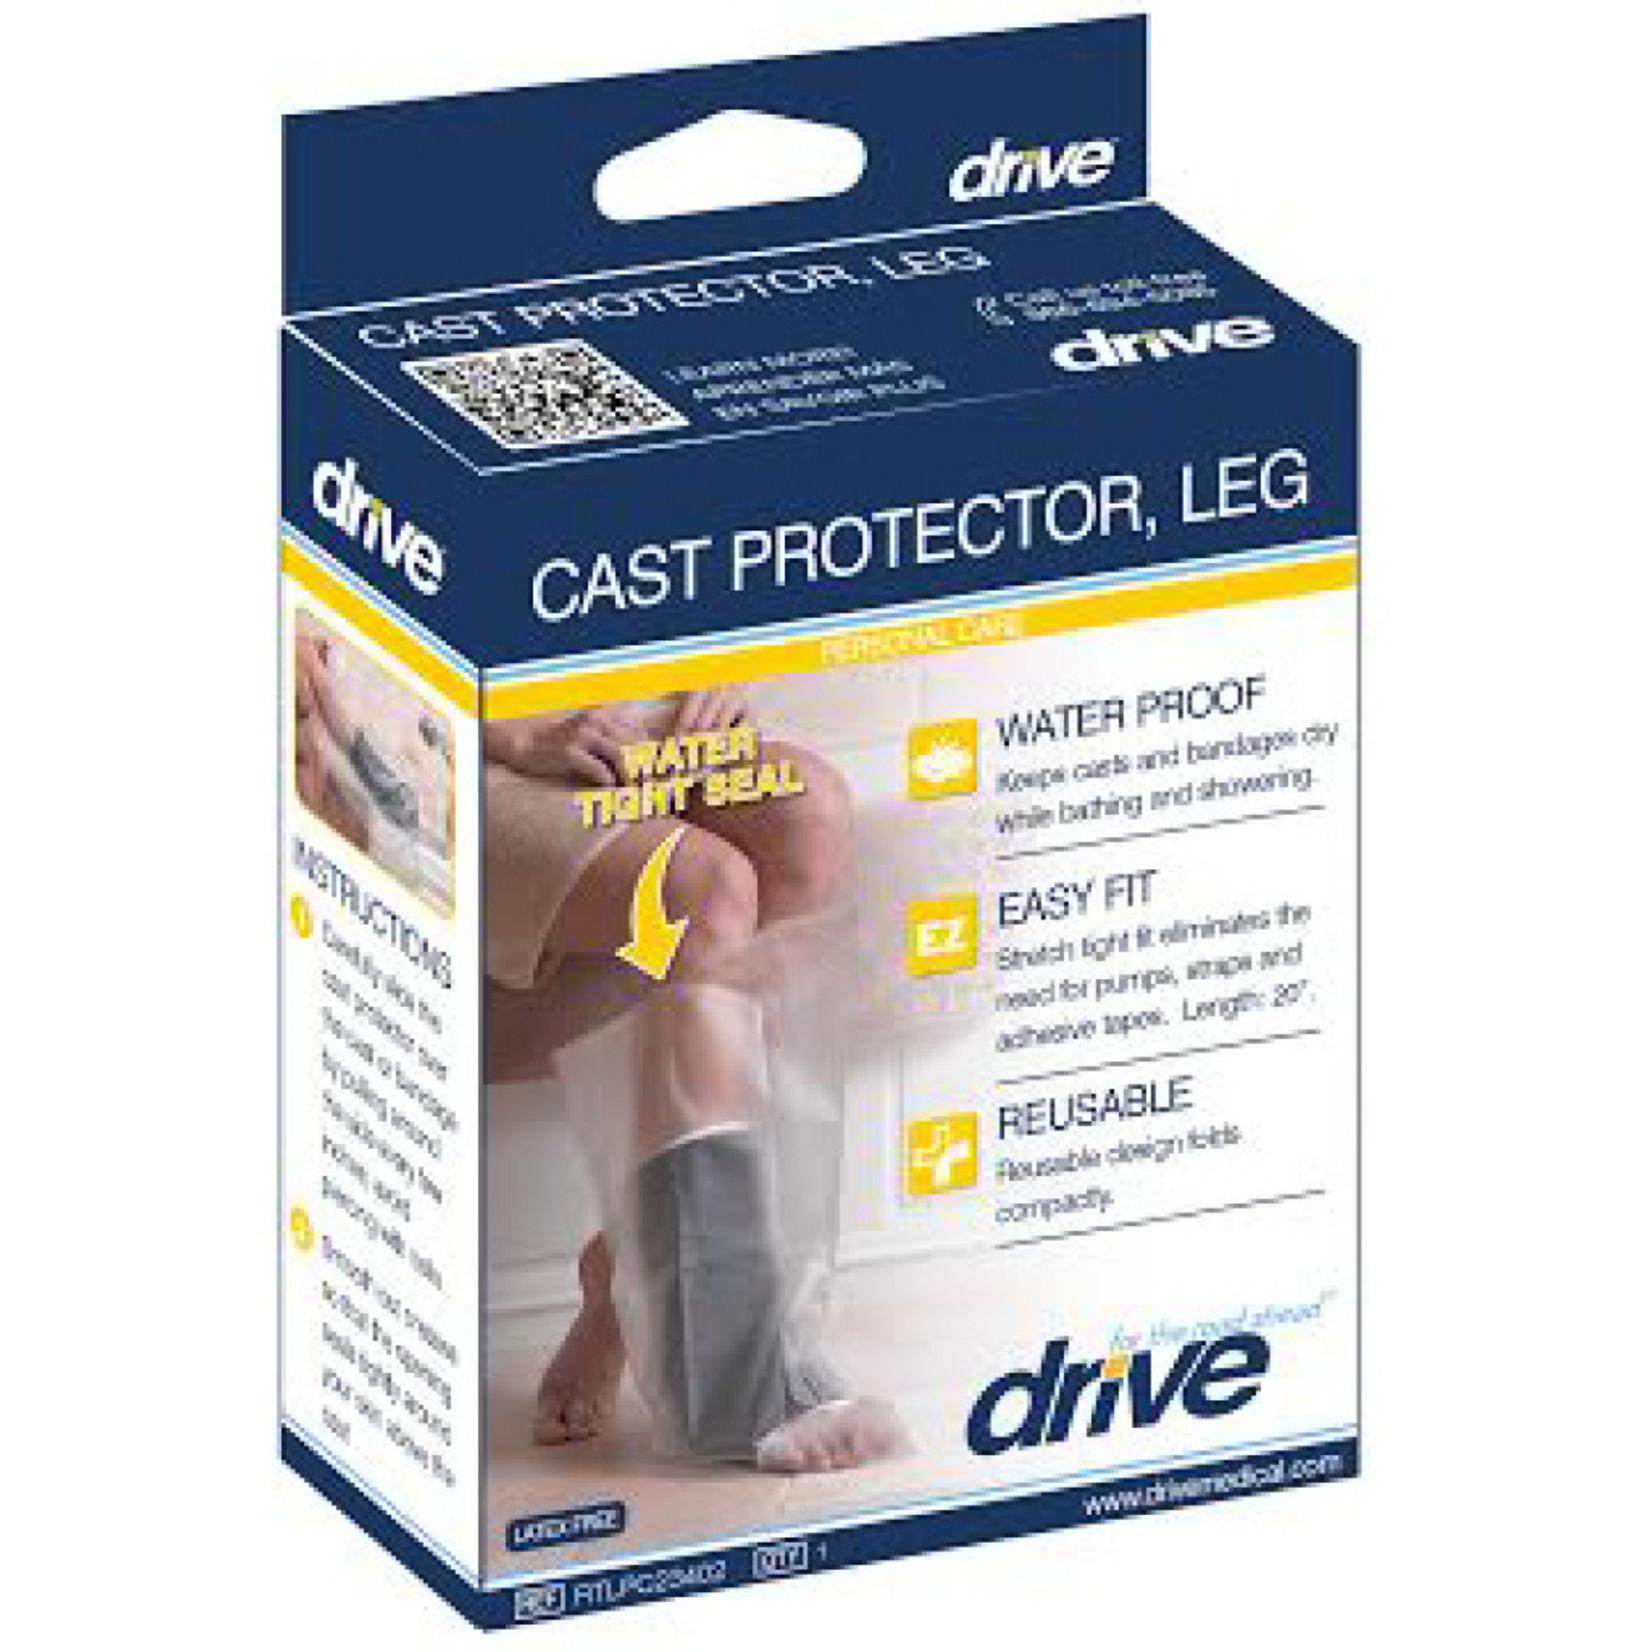 Drive Leg Cast Protector